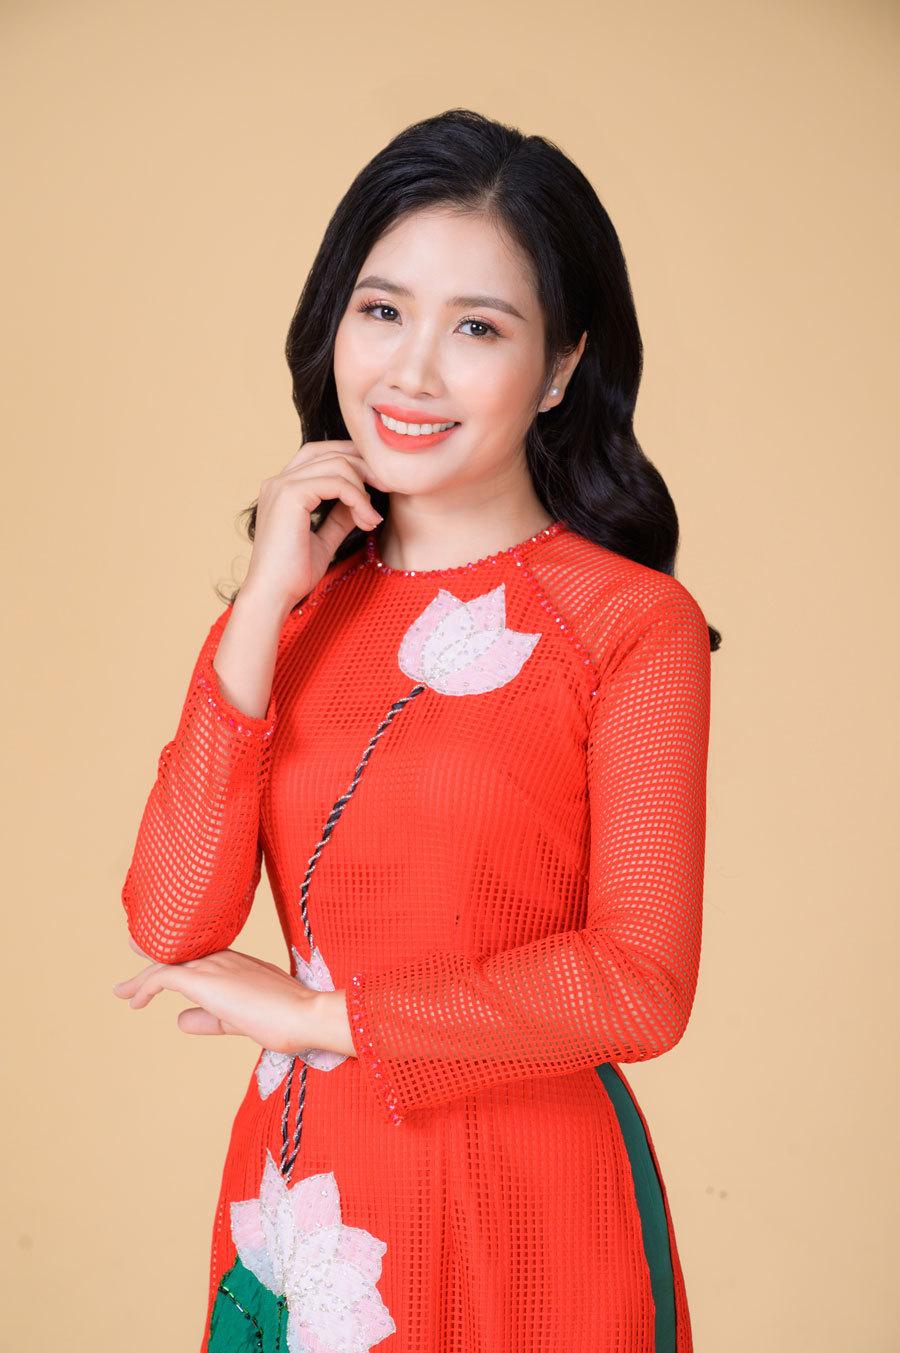 Trần Hồng Nhung